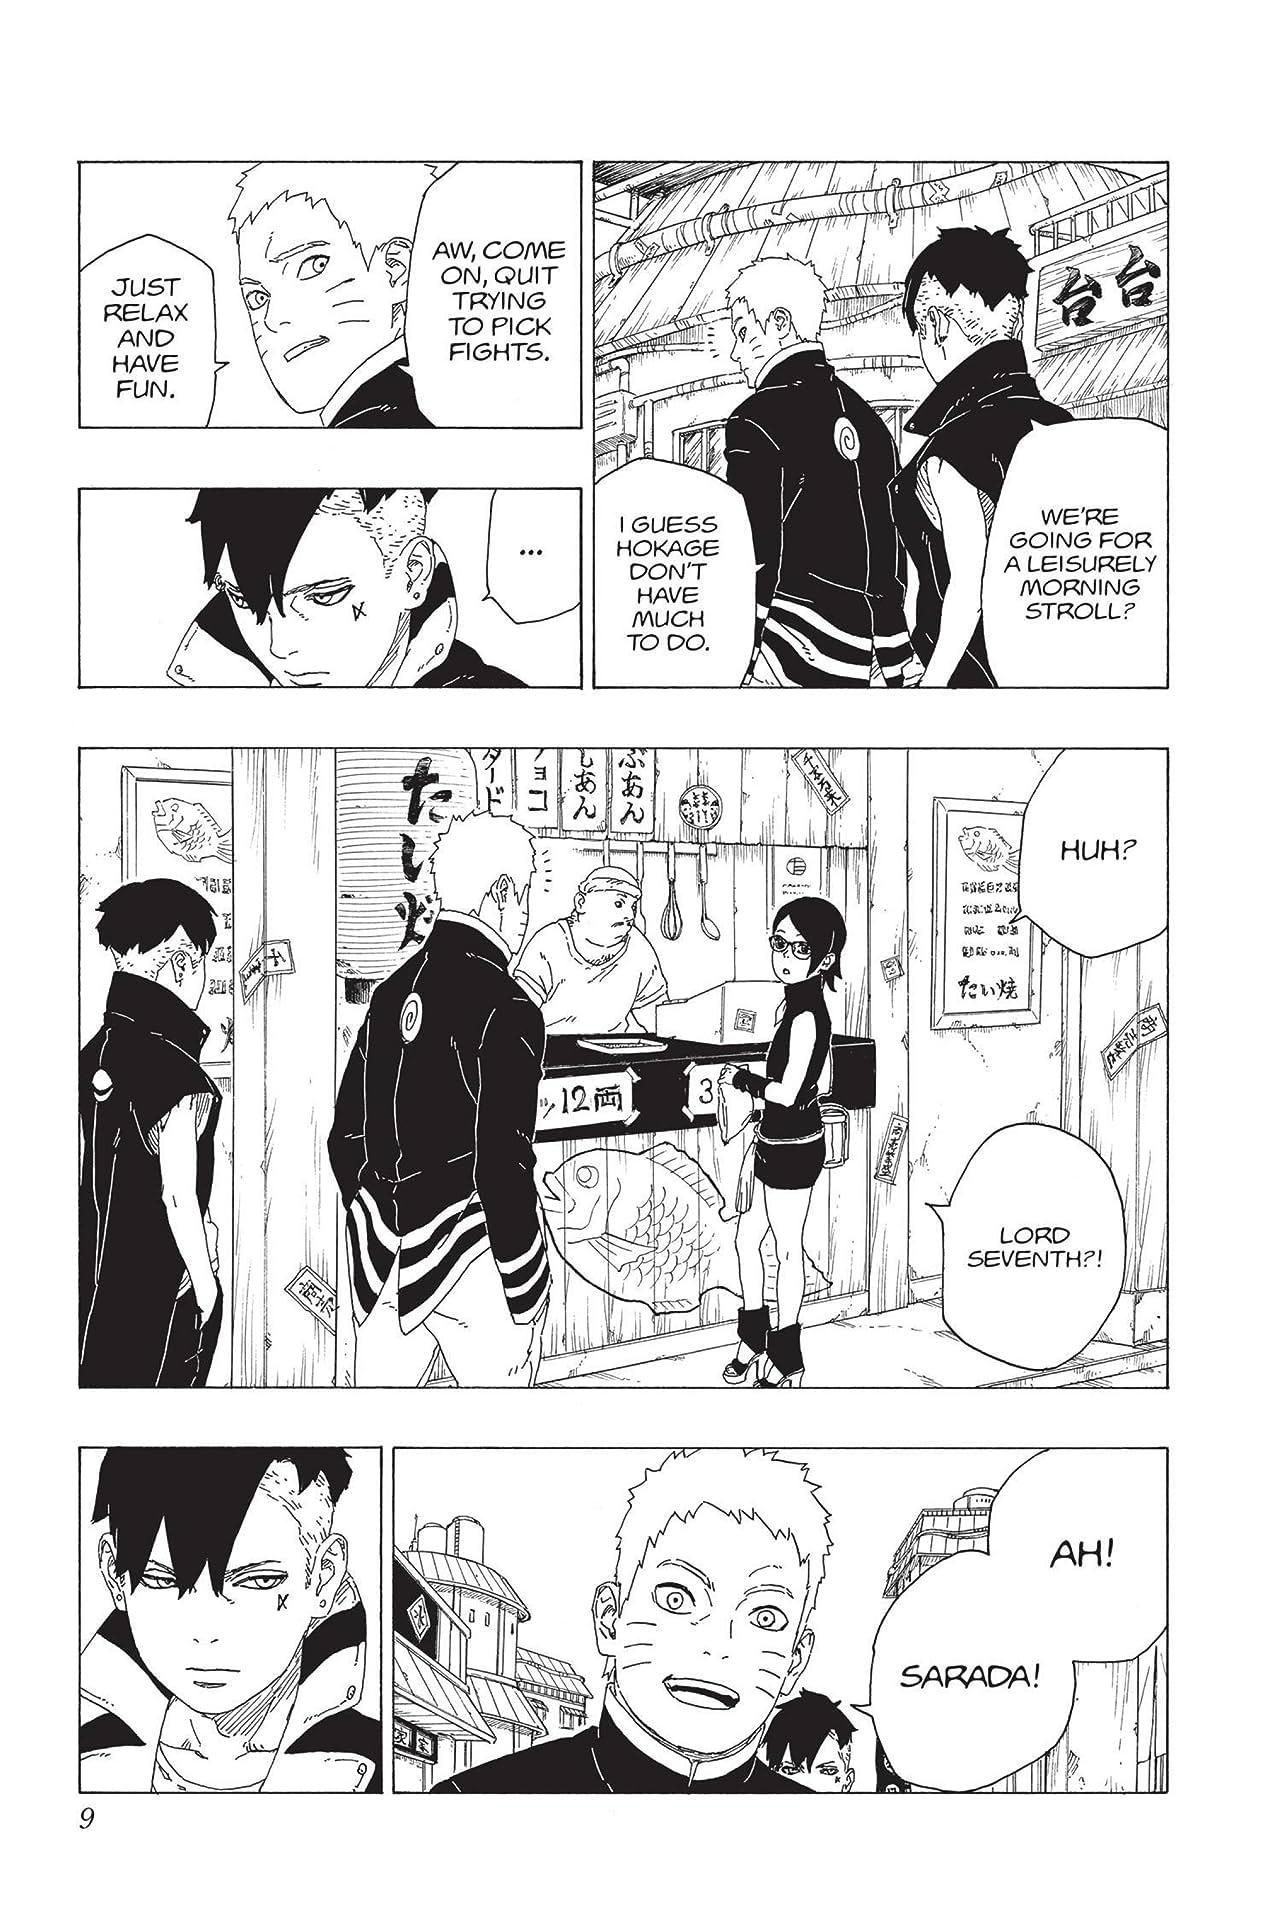 Boruto: Naruto Next Generations Vol. 8: Monsters